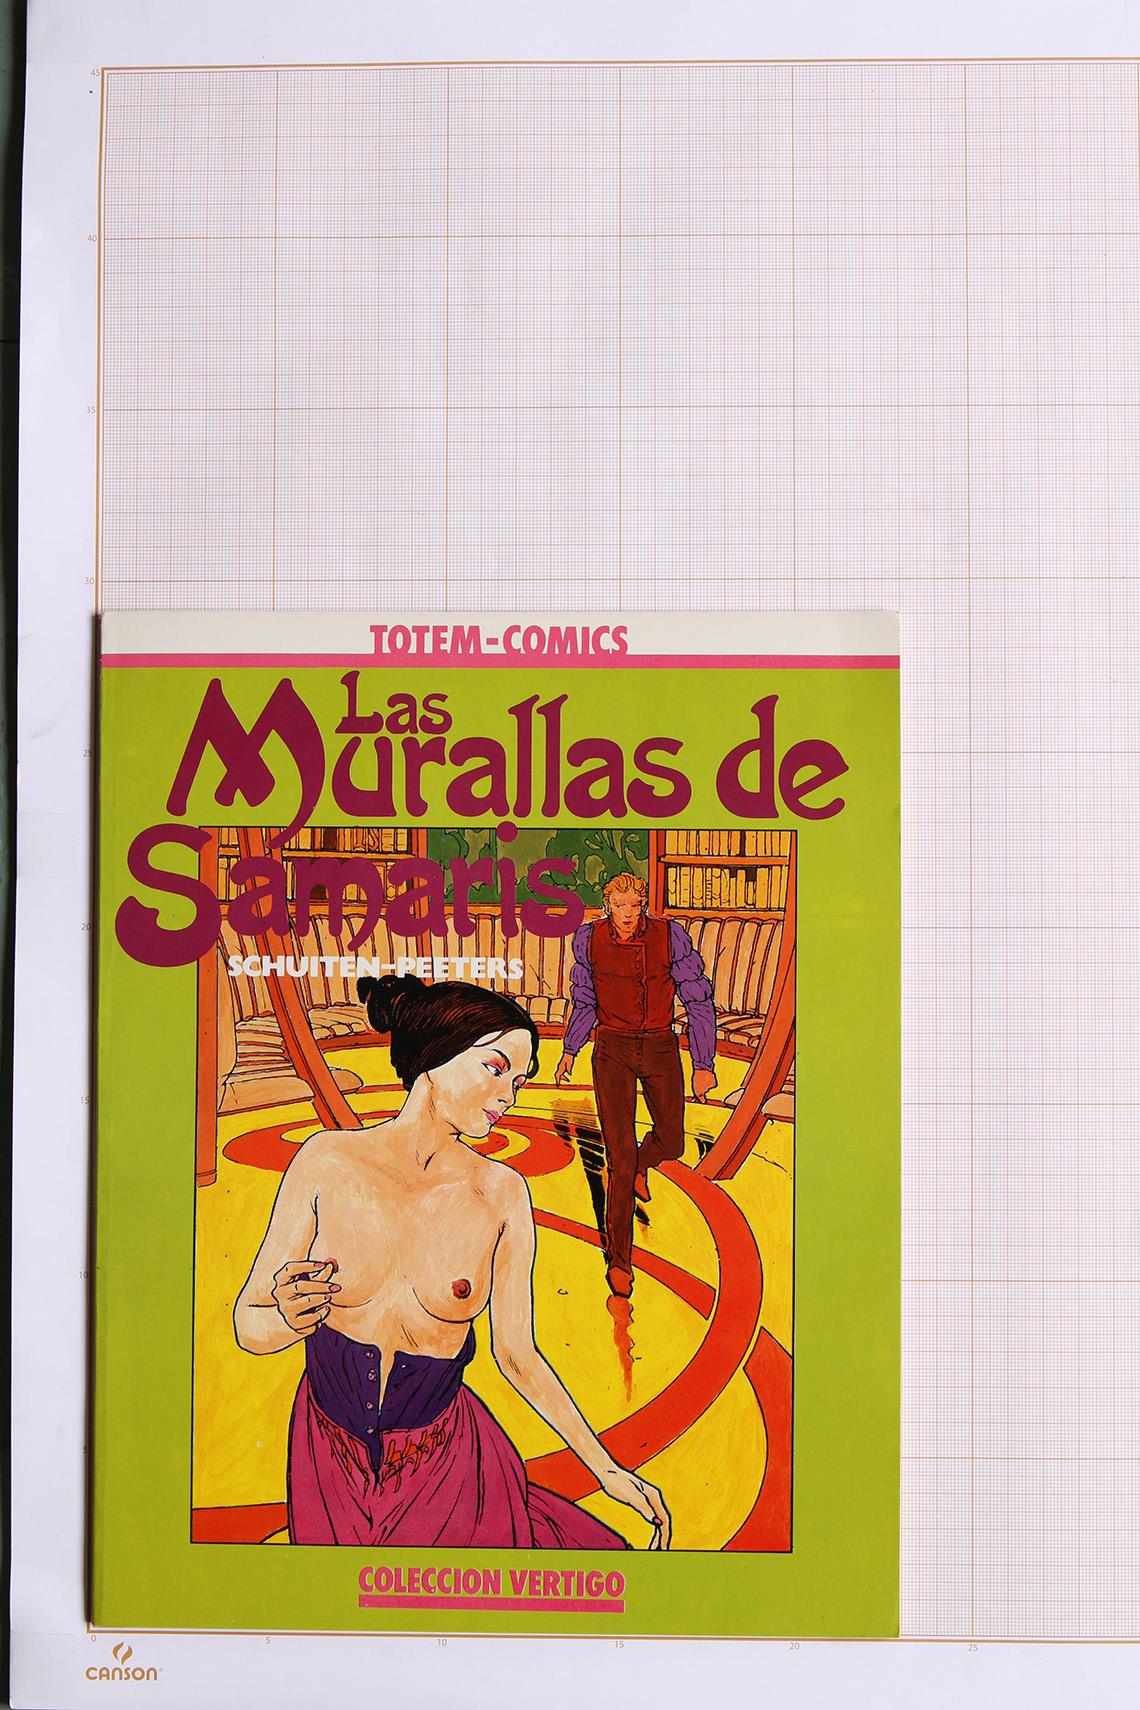 Las Murallas de Samaris, F.Schuiten & B.Peeters - Nueva Frontera© Maison Autrique, 1983